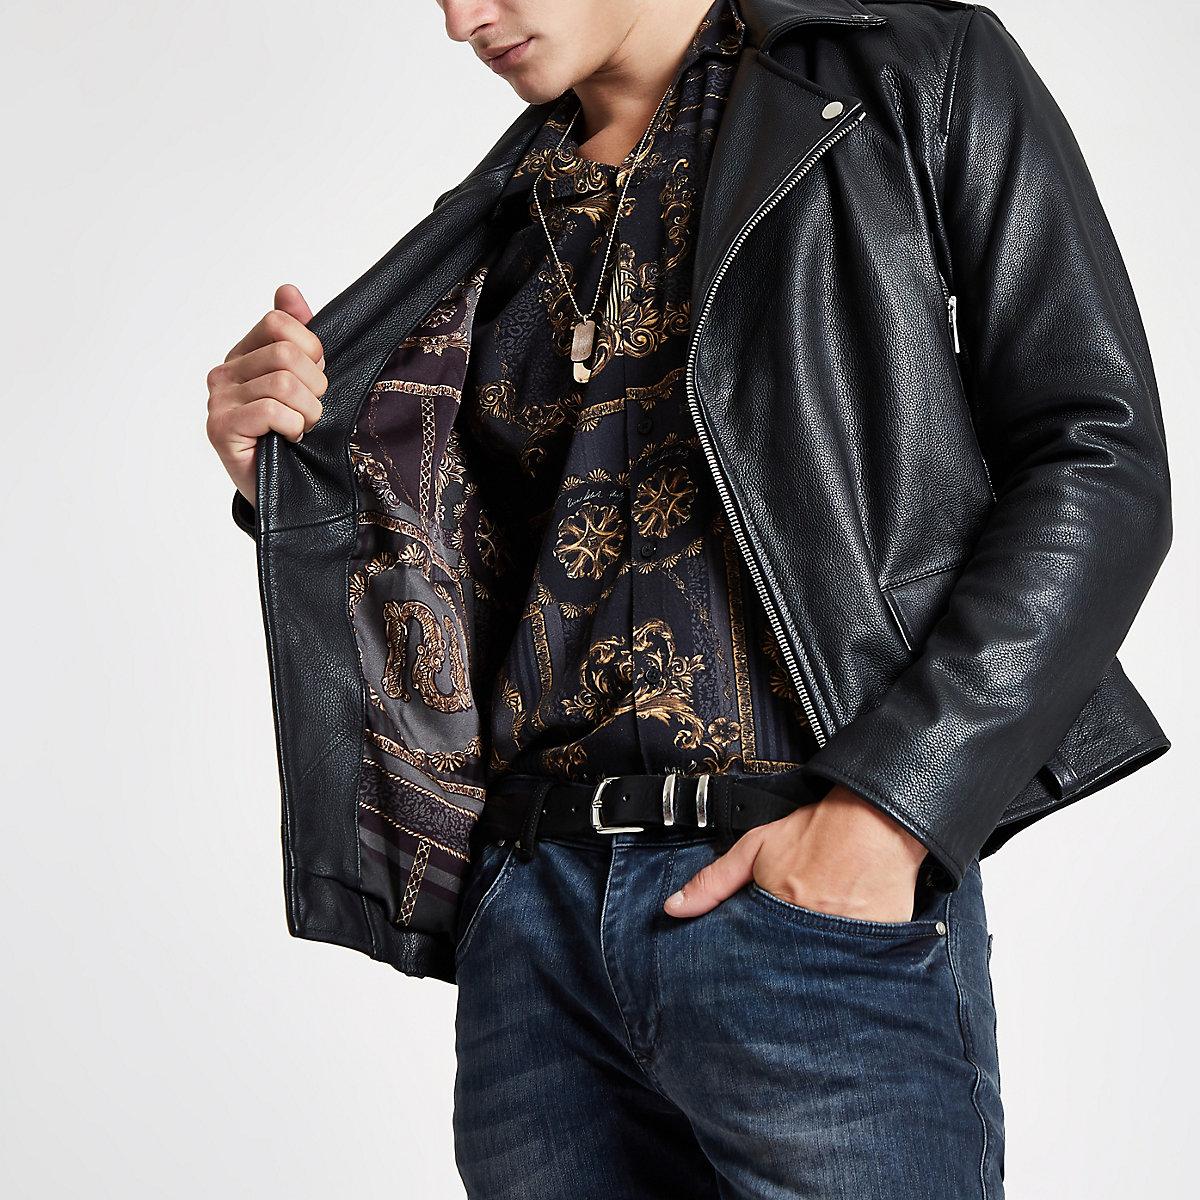 Ri 30 Black Leather Biker Jacket Jackets Coats Jackets Men